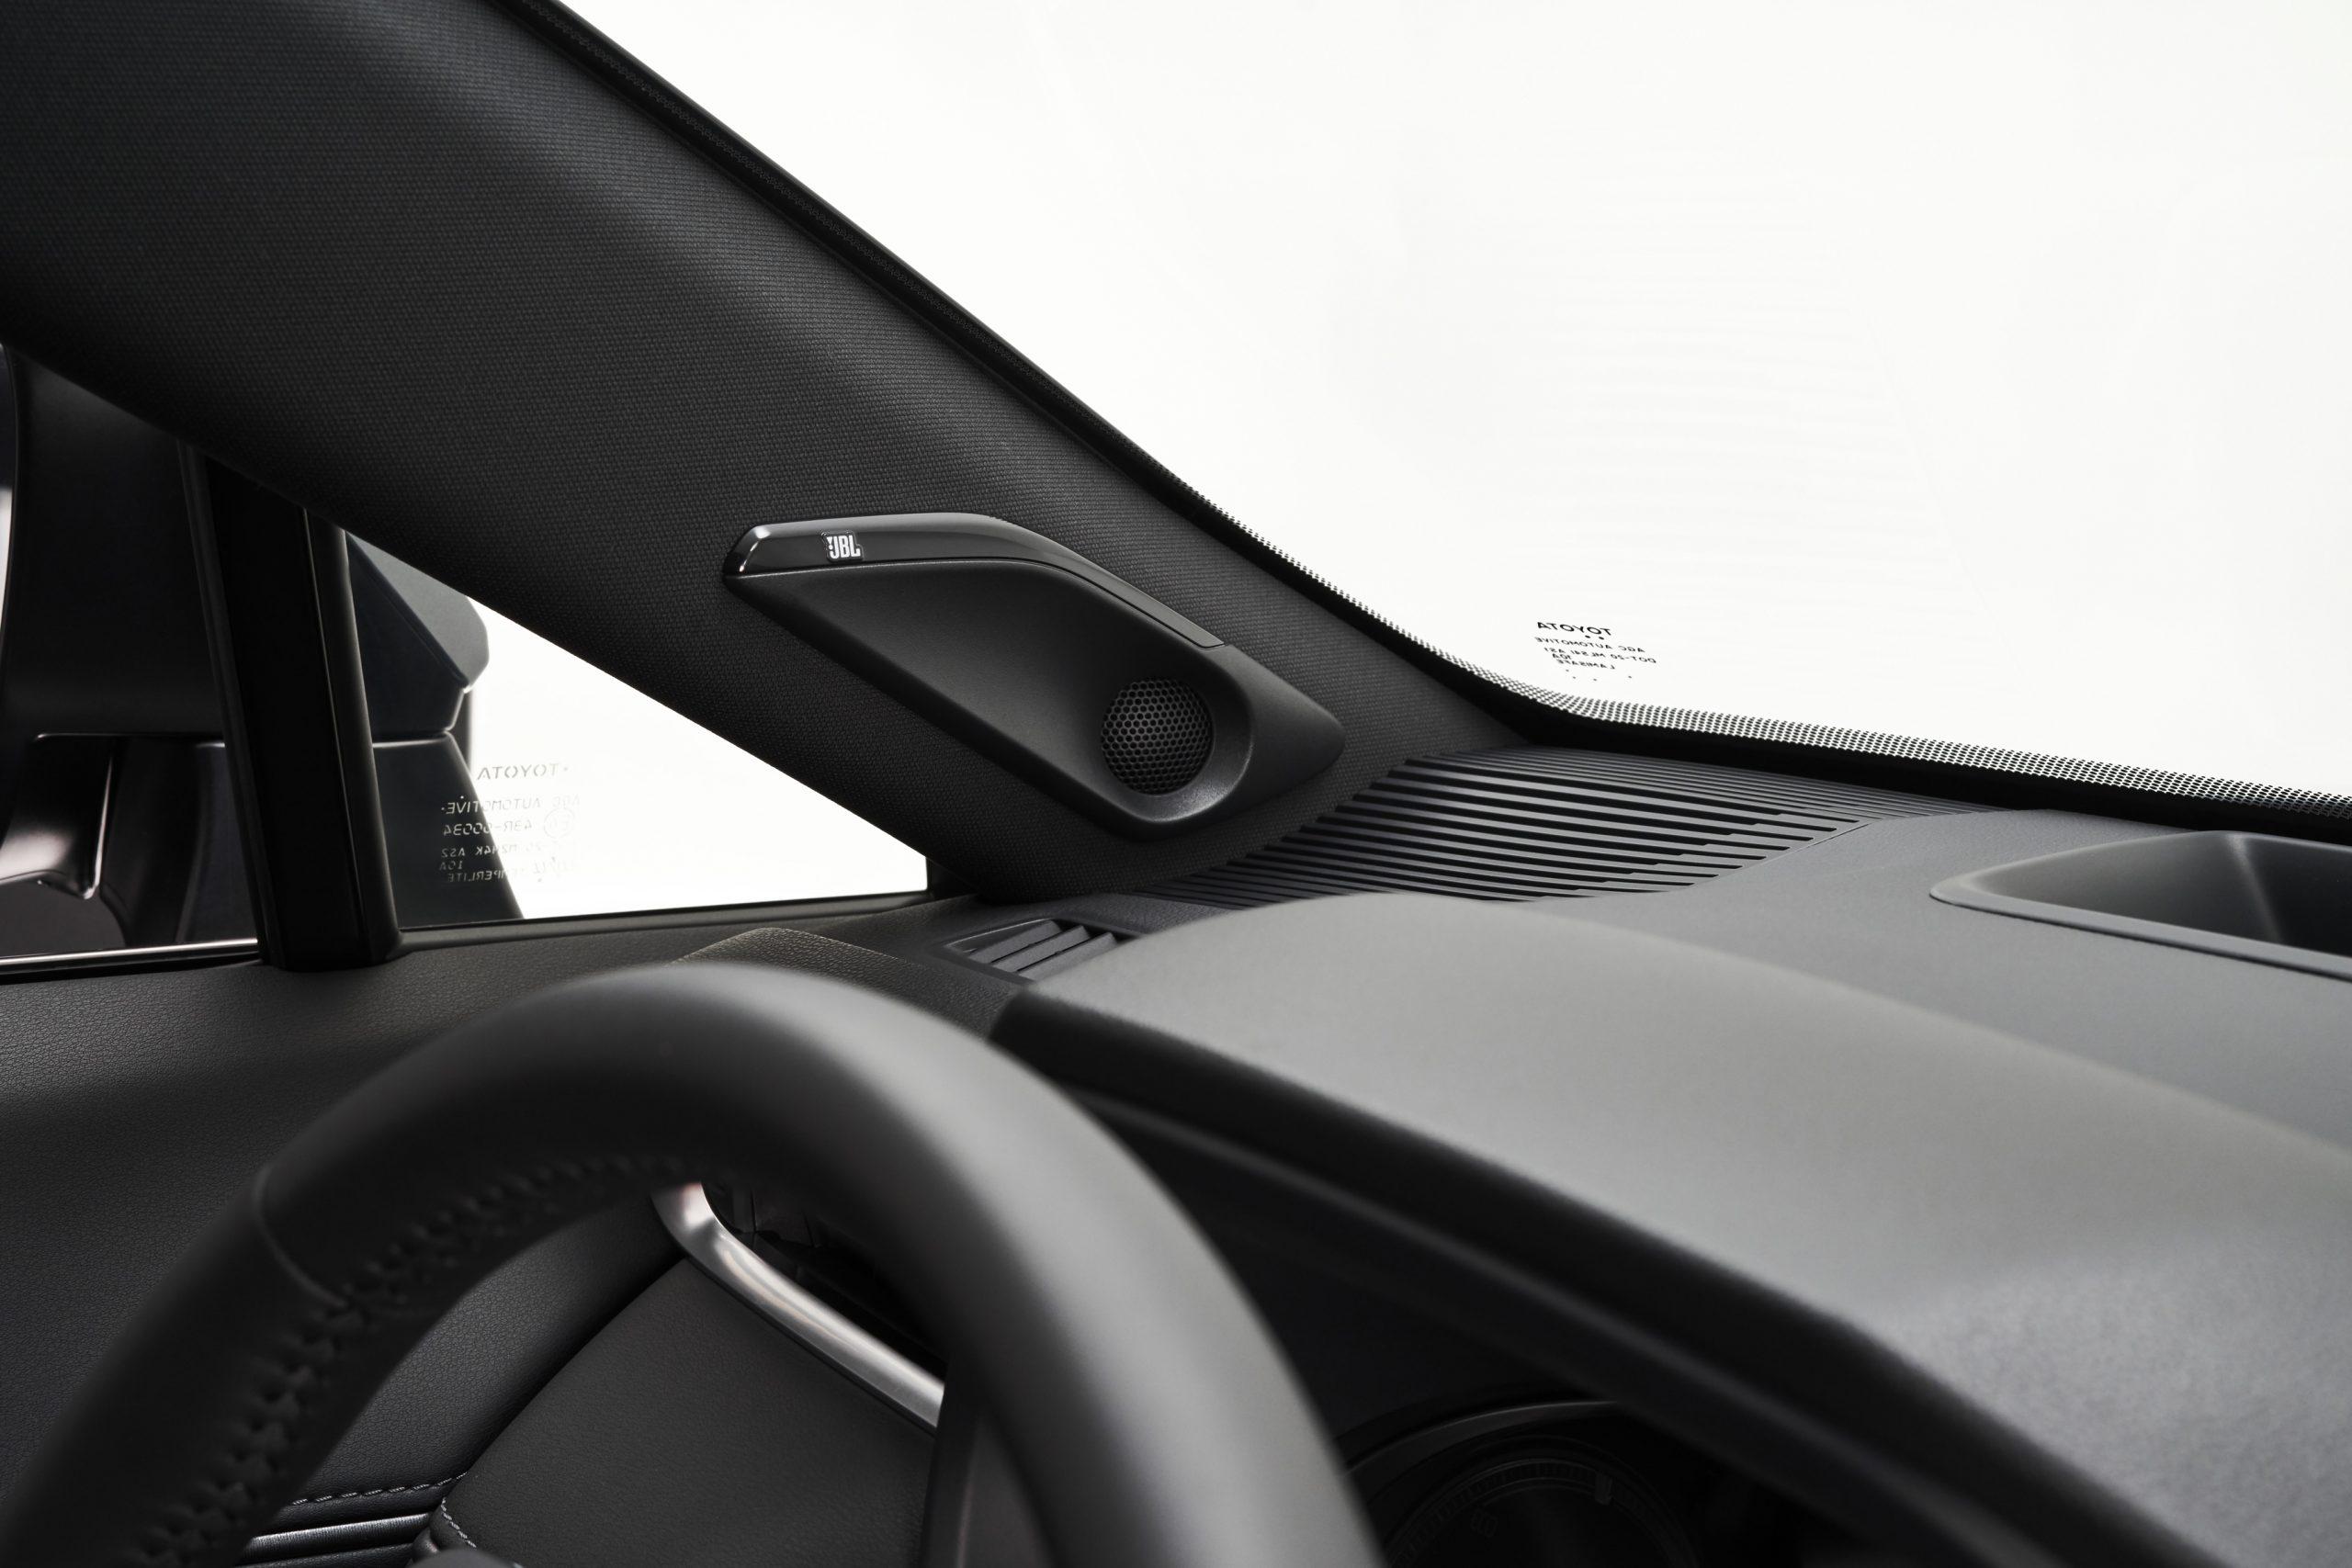 2021-Toyota-Venza_Interior_007-scaled.jpg